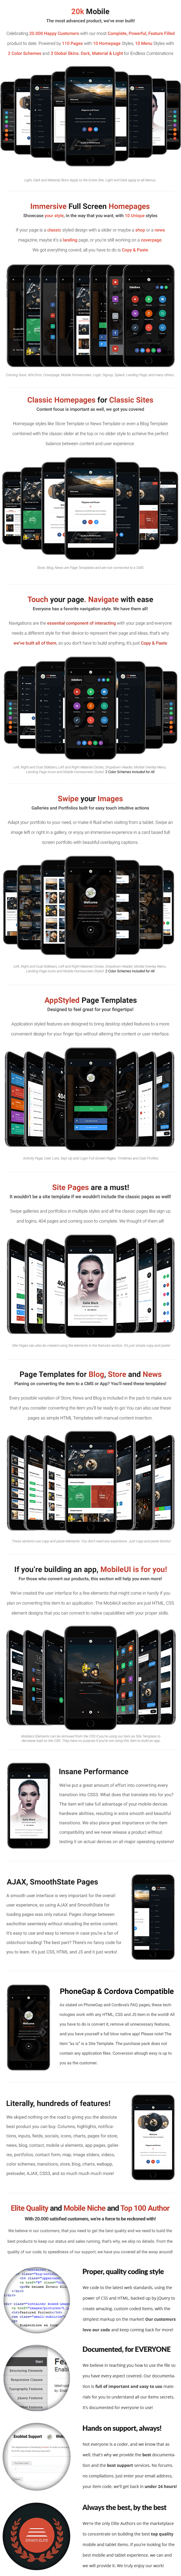 20k Mobile | Mobile Template - 9